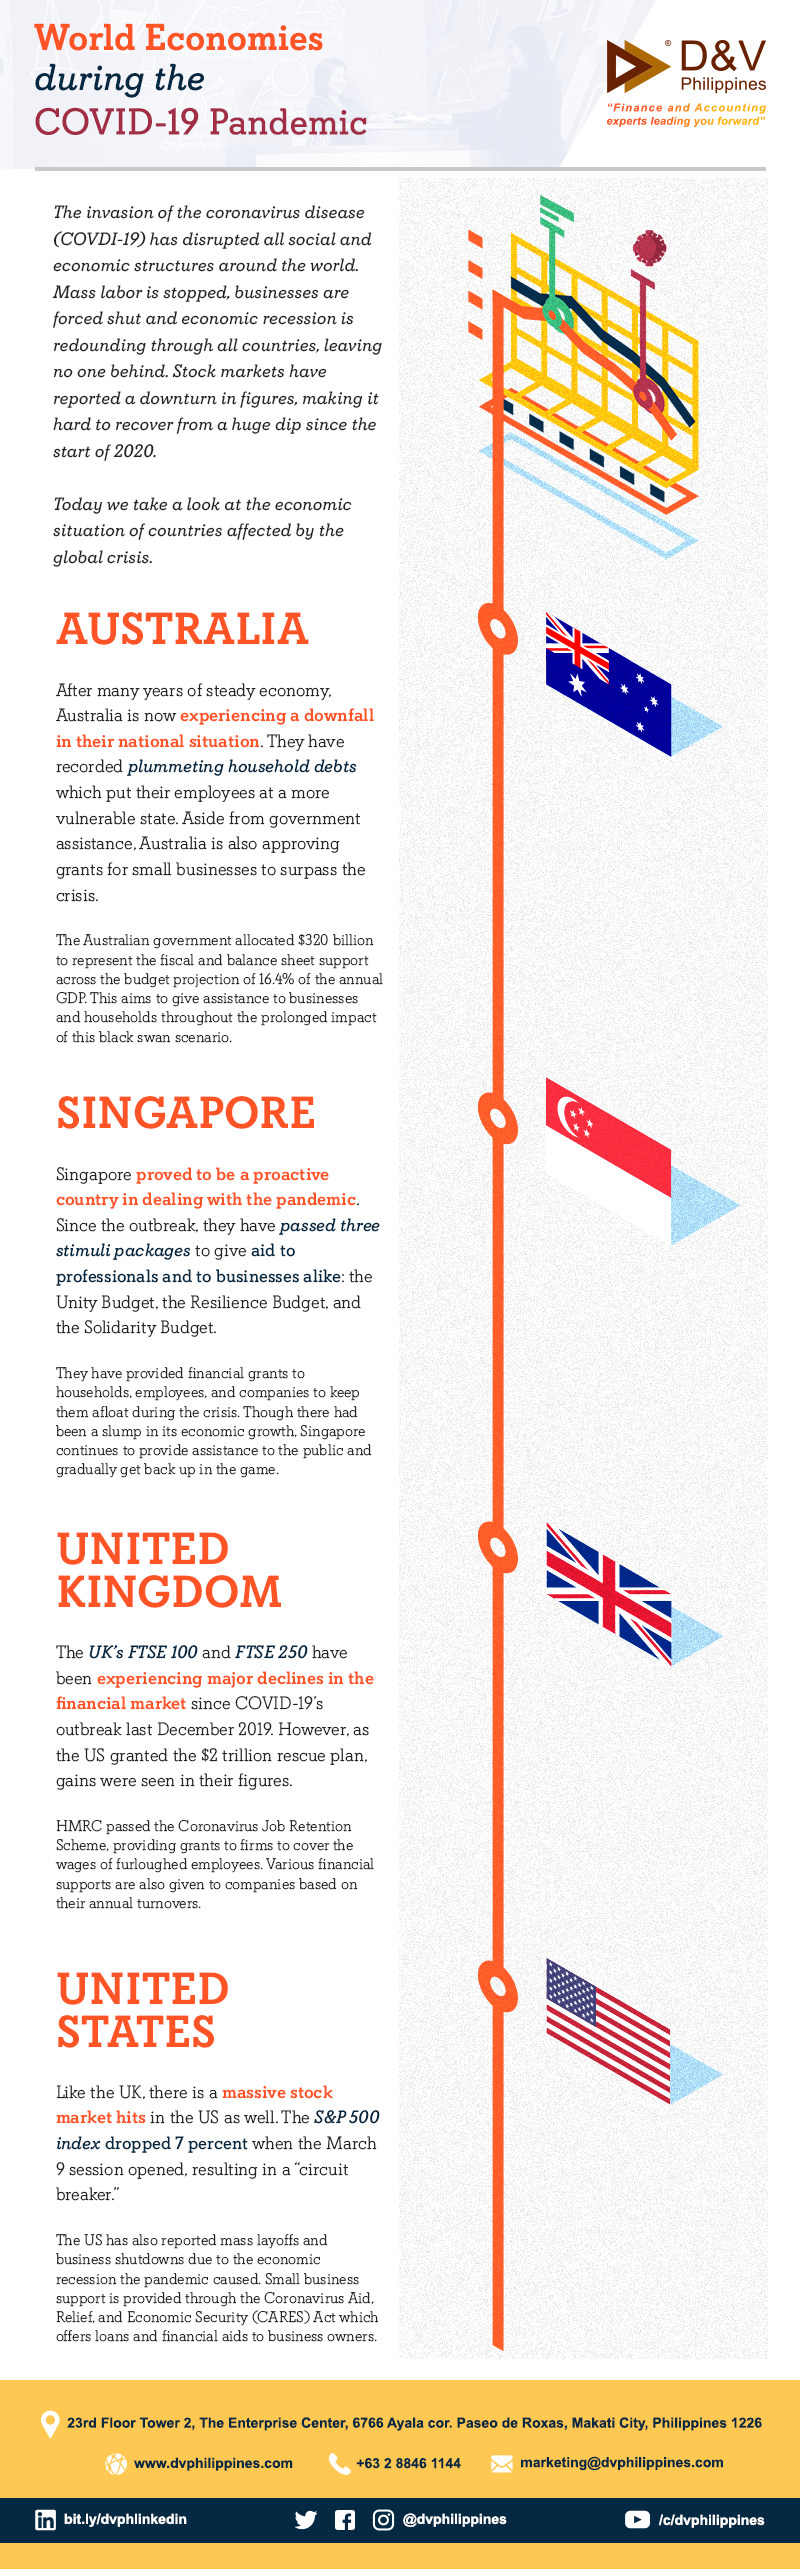 WorldEconomiesDuringCOVID19_Infograph